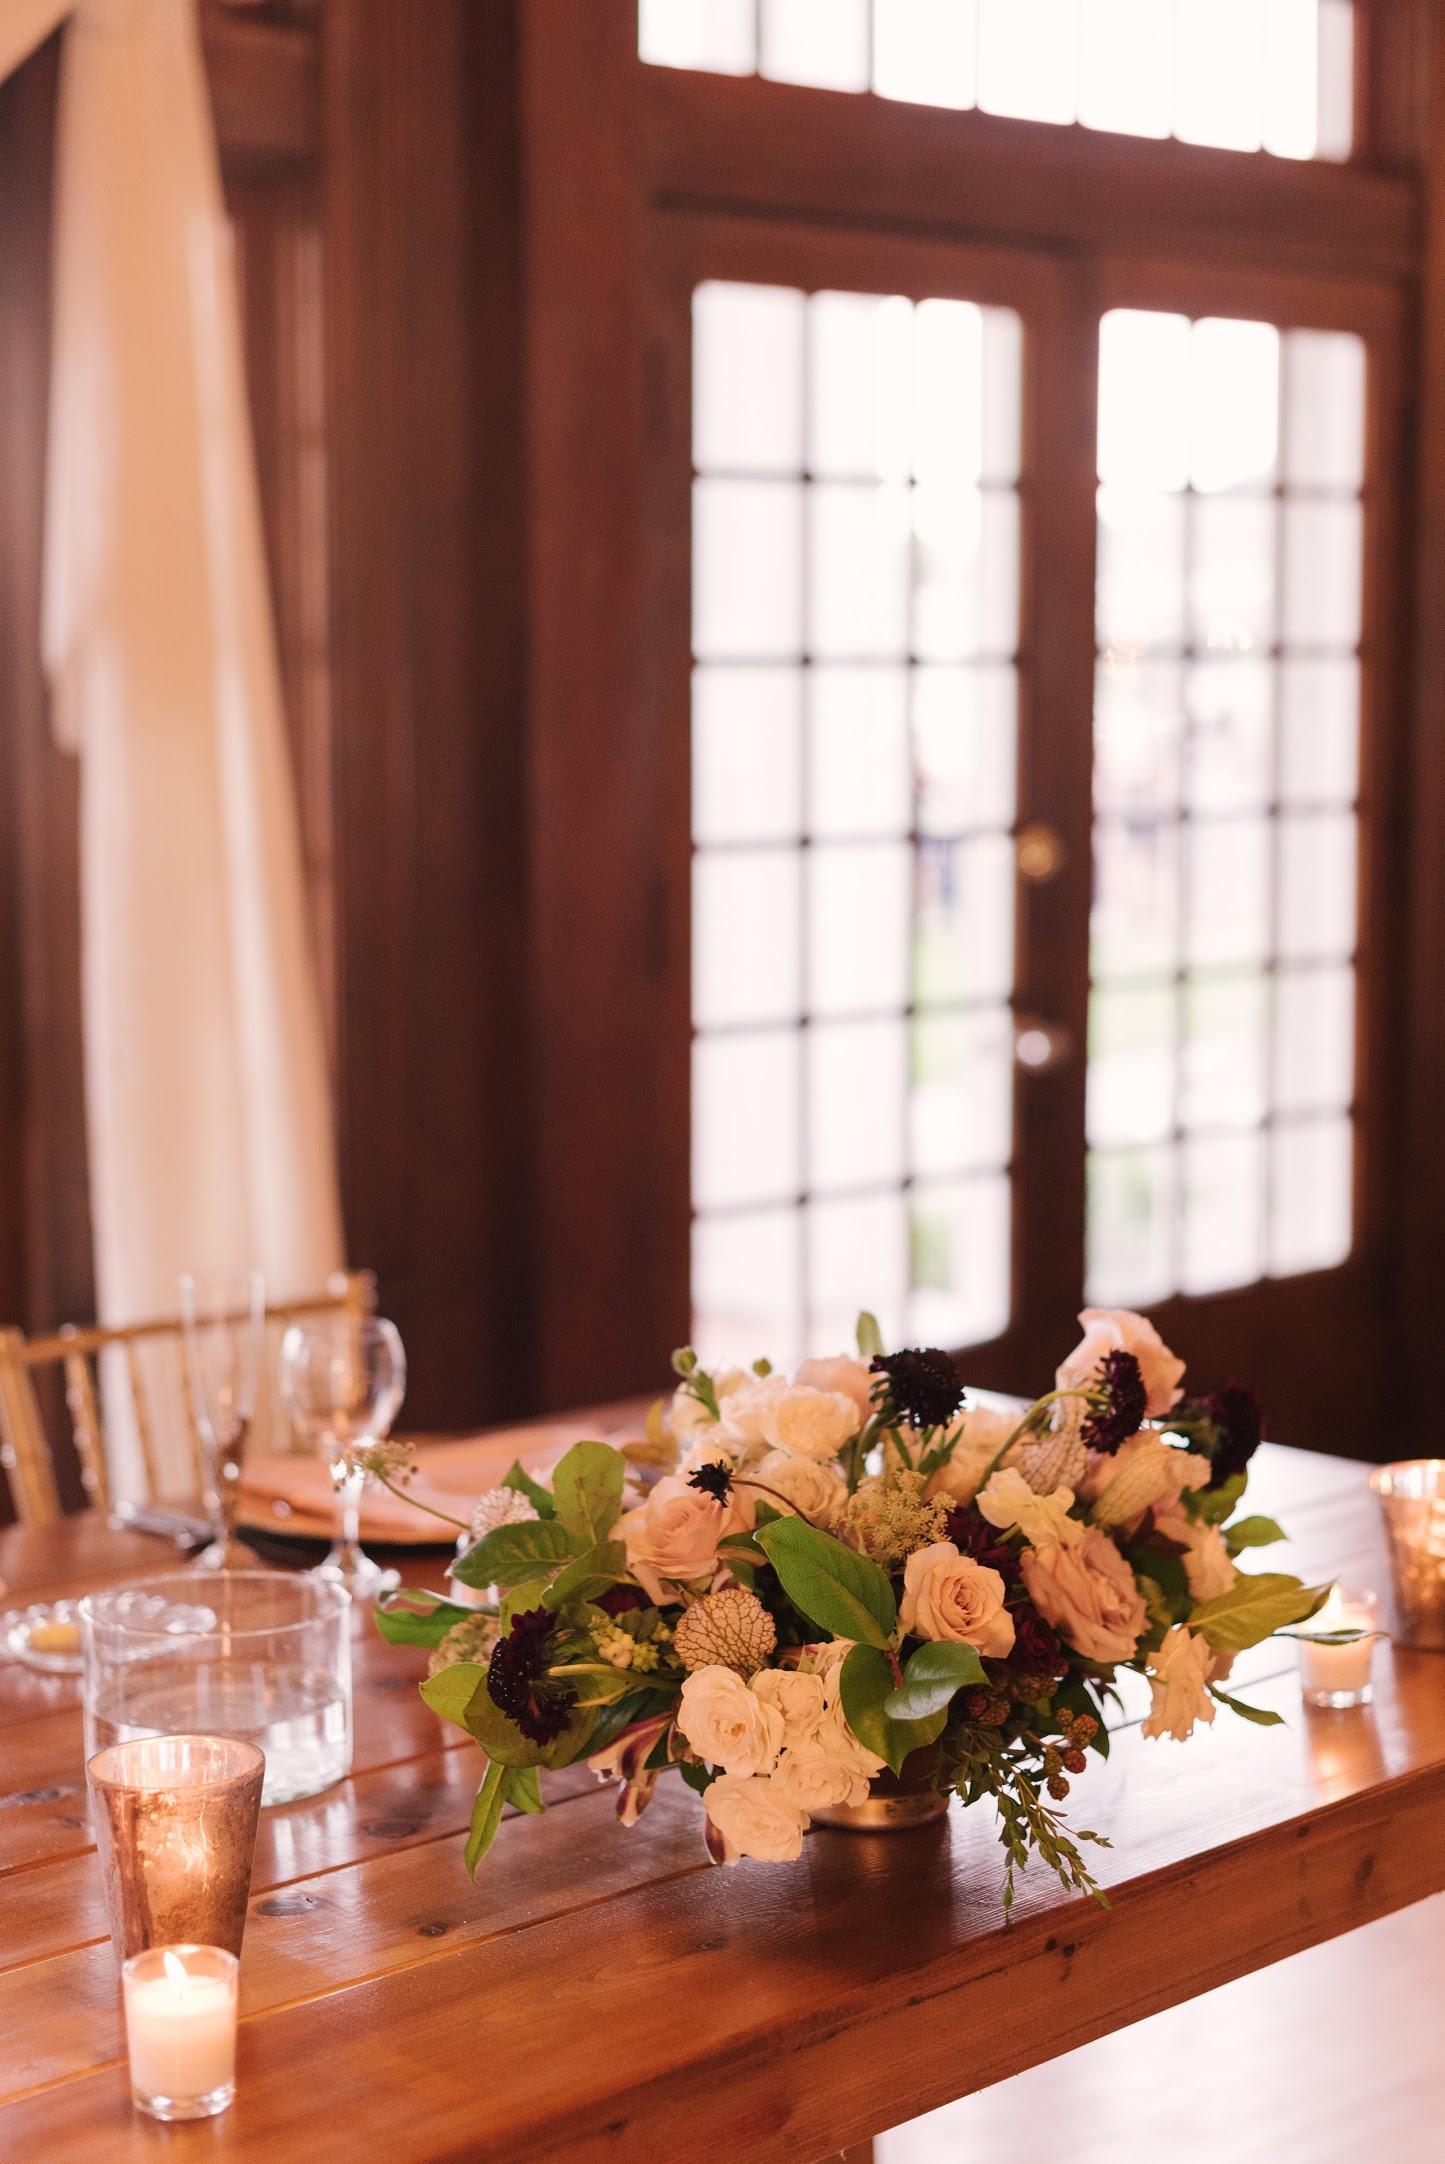 Field-Gems-Photography-Detroit-Michigan-Wedding-Photographer-Family-Photographer-Photobooth-090818-892.jpg